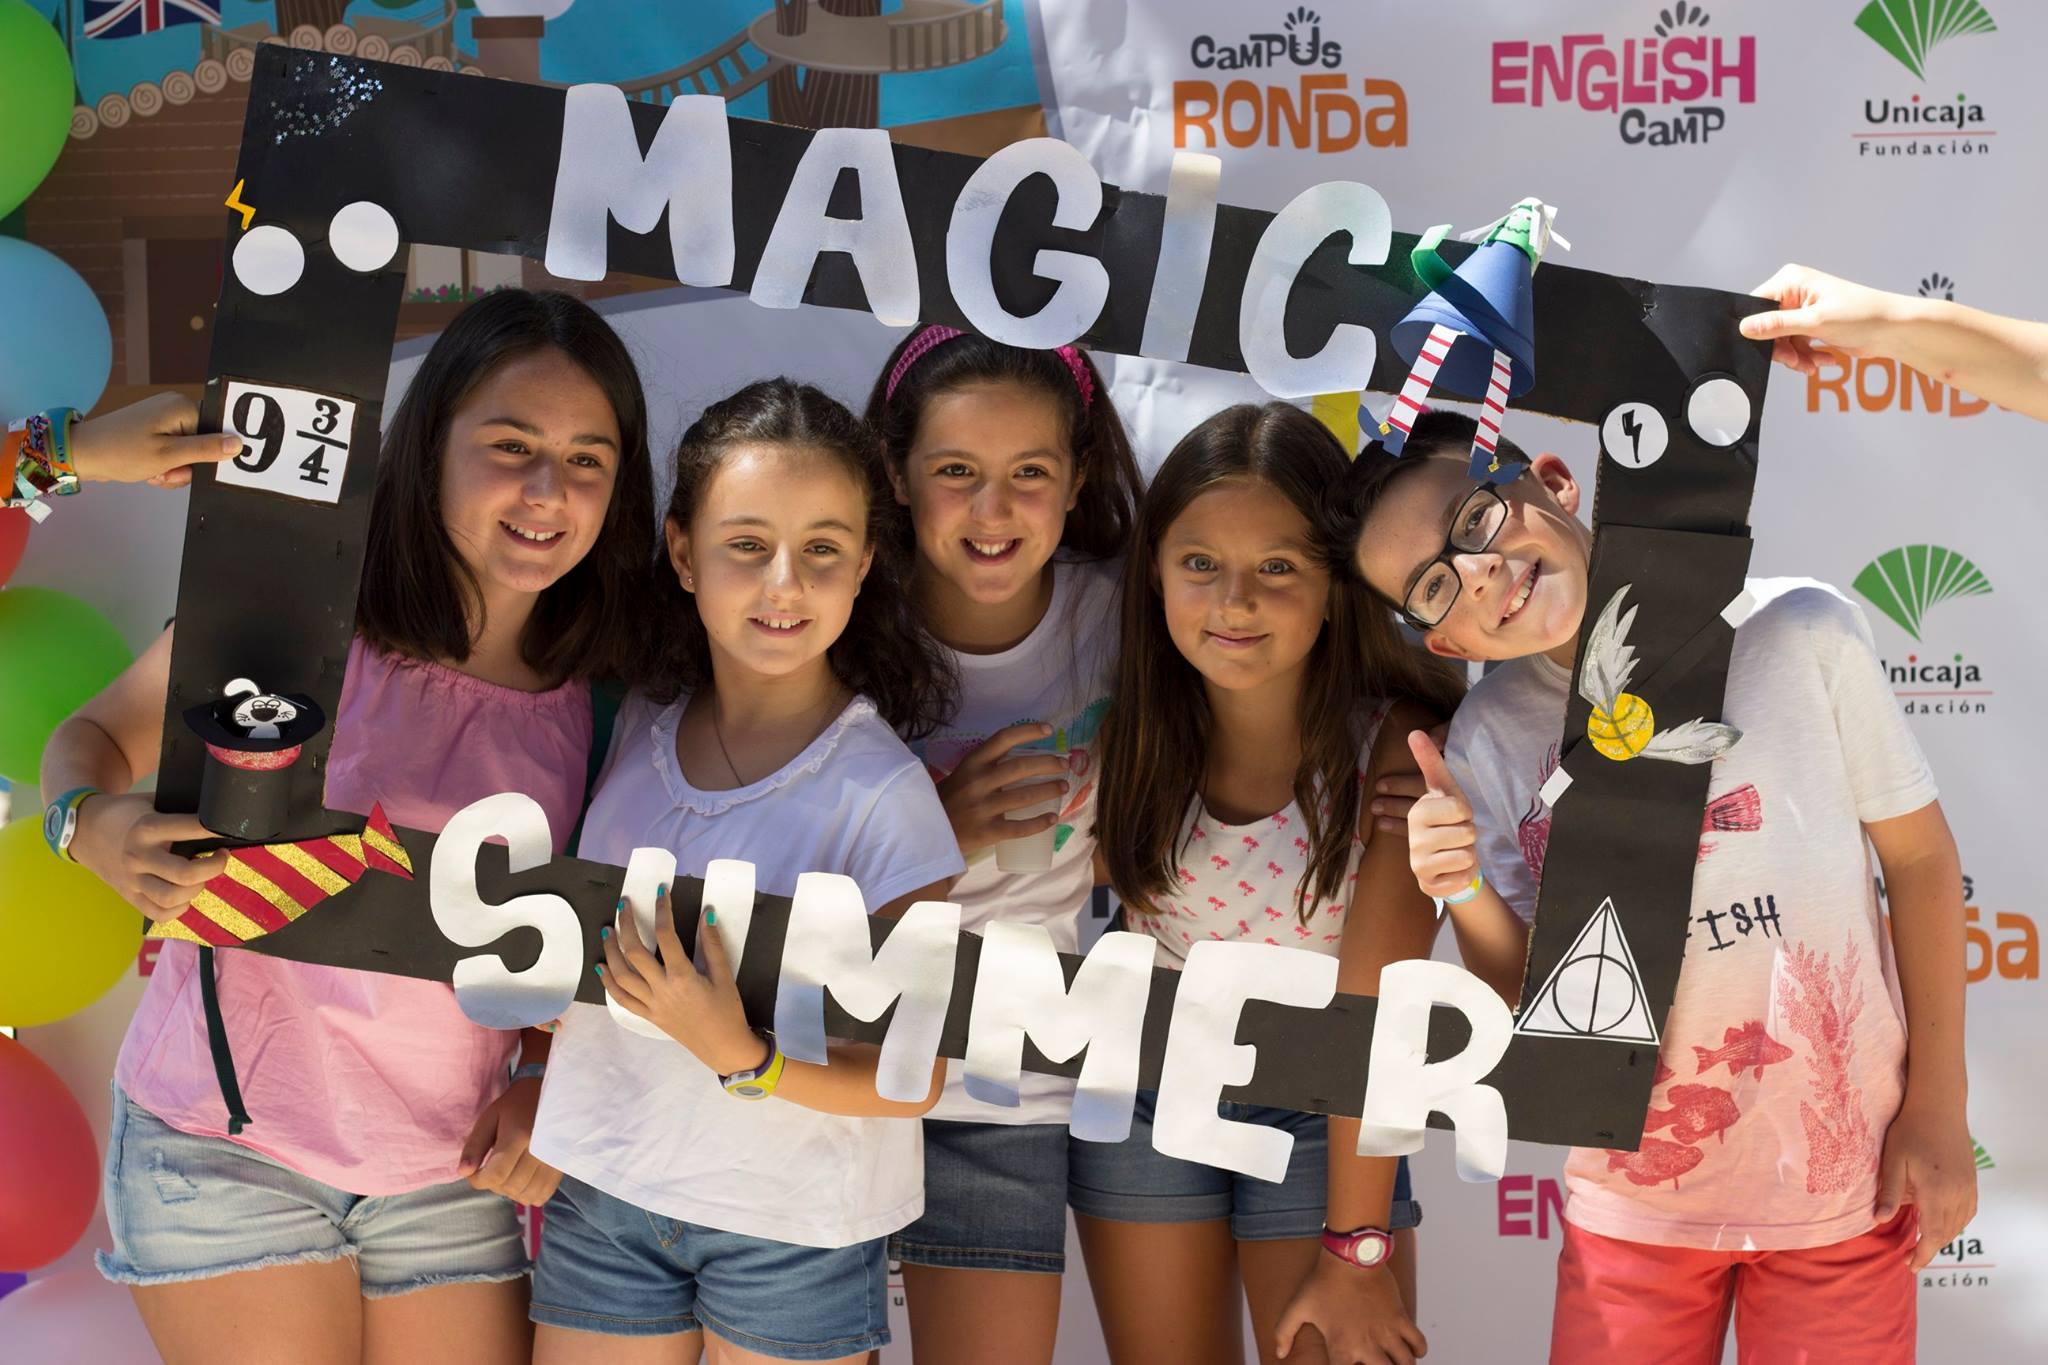 Ayer Comenzó El Segundo Turno De English Camp 2017